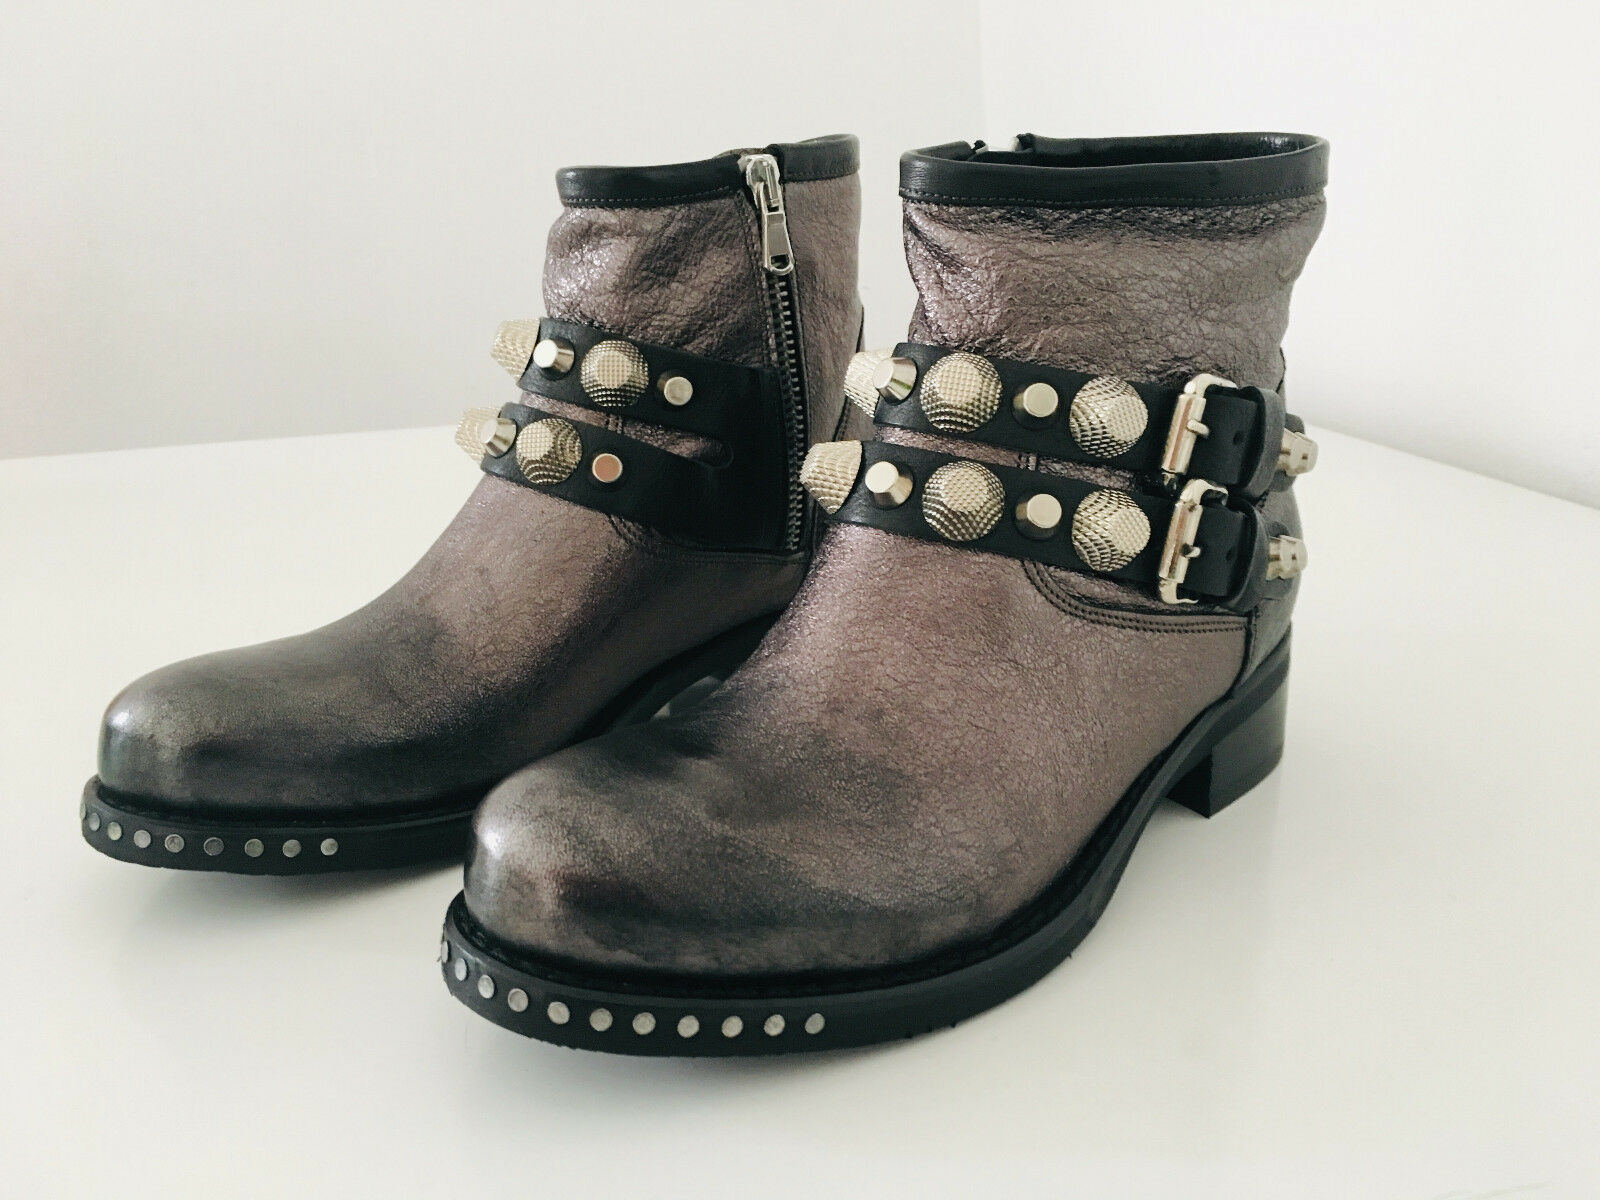 MIMMU - Stiefel Stiefel Nieten glänzend metallic  - NEU S38OK Gr 38  S38OK NEU 260e3c